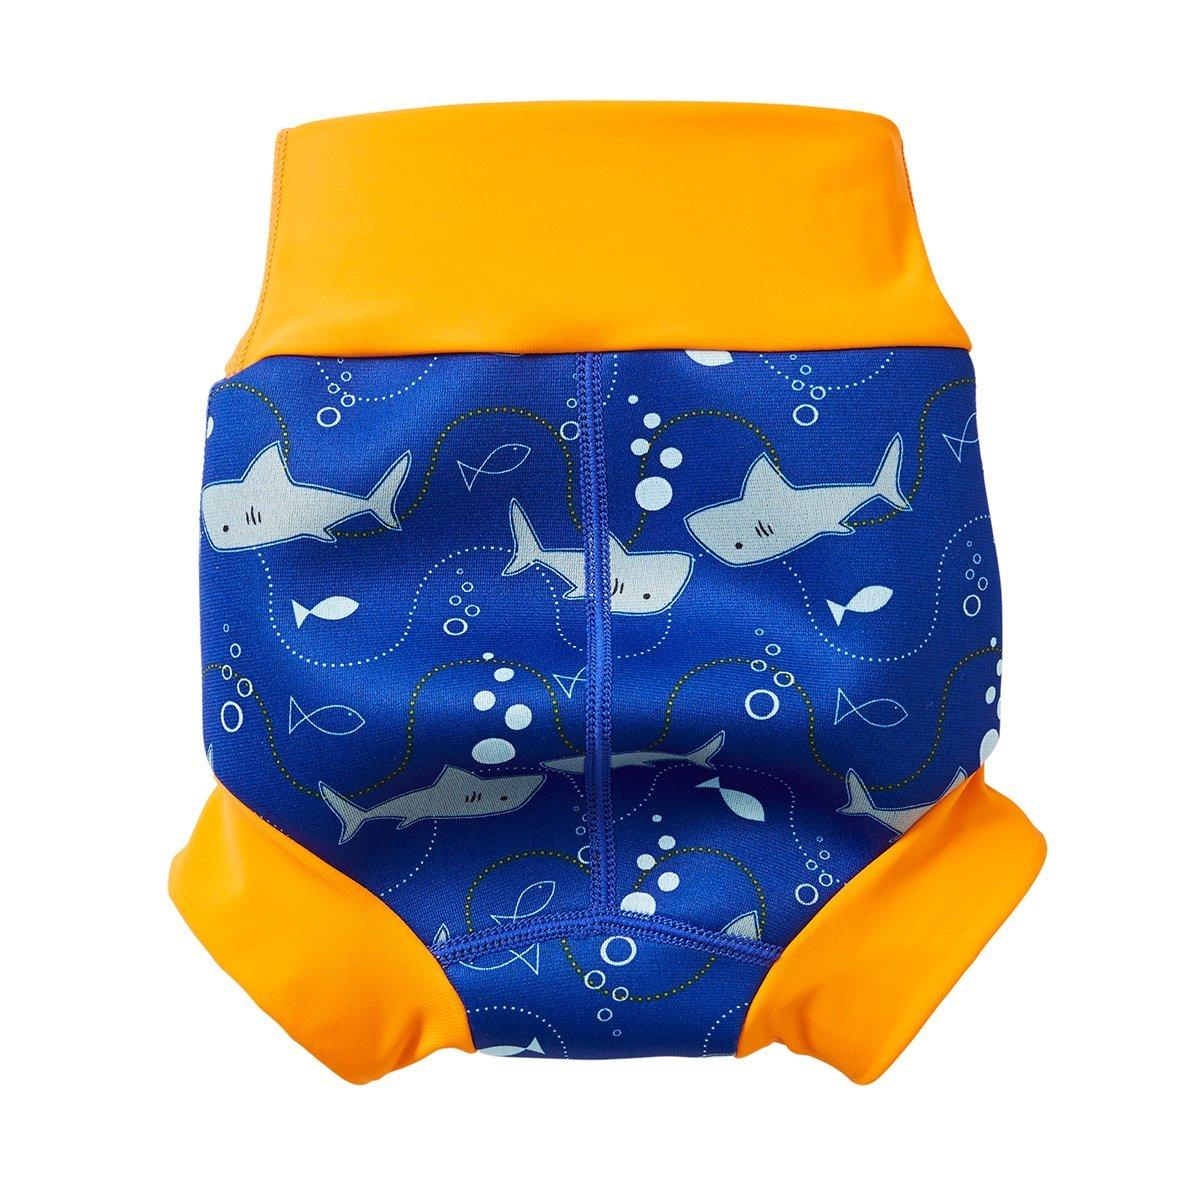 Splash-About-Happy-Nappy-Baby-amp-Toddler-Swimwear-Nappy-and-Shorts-Sun-Safe thumbnail 35